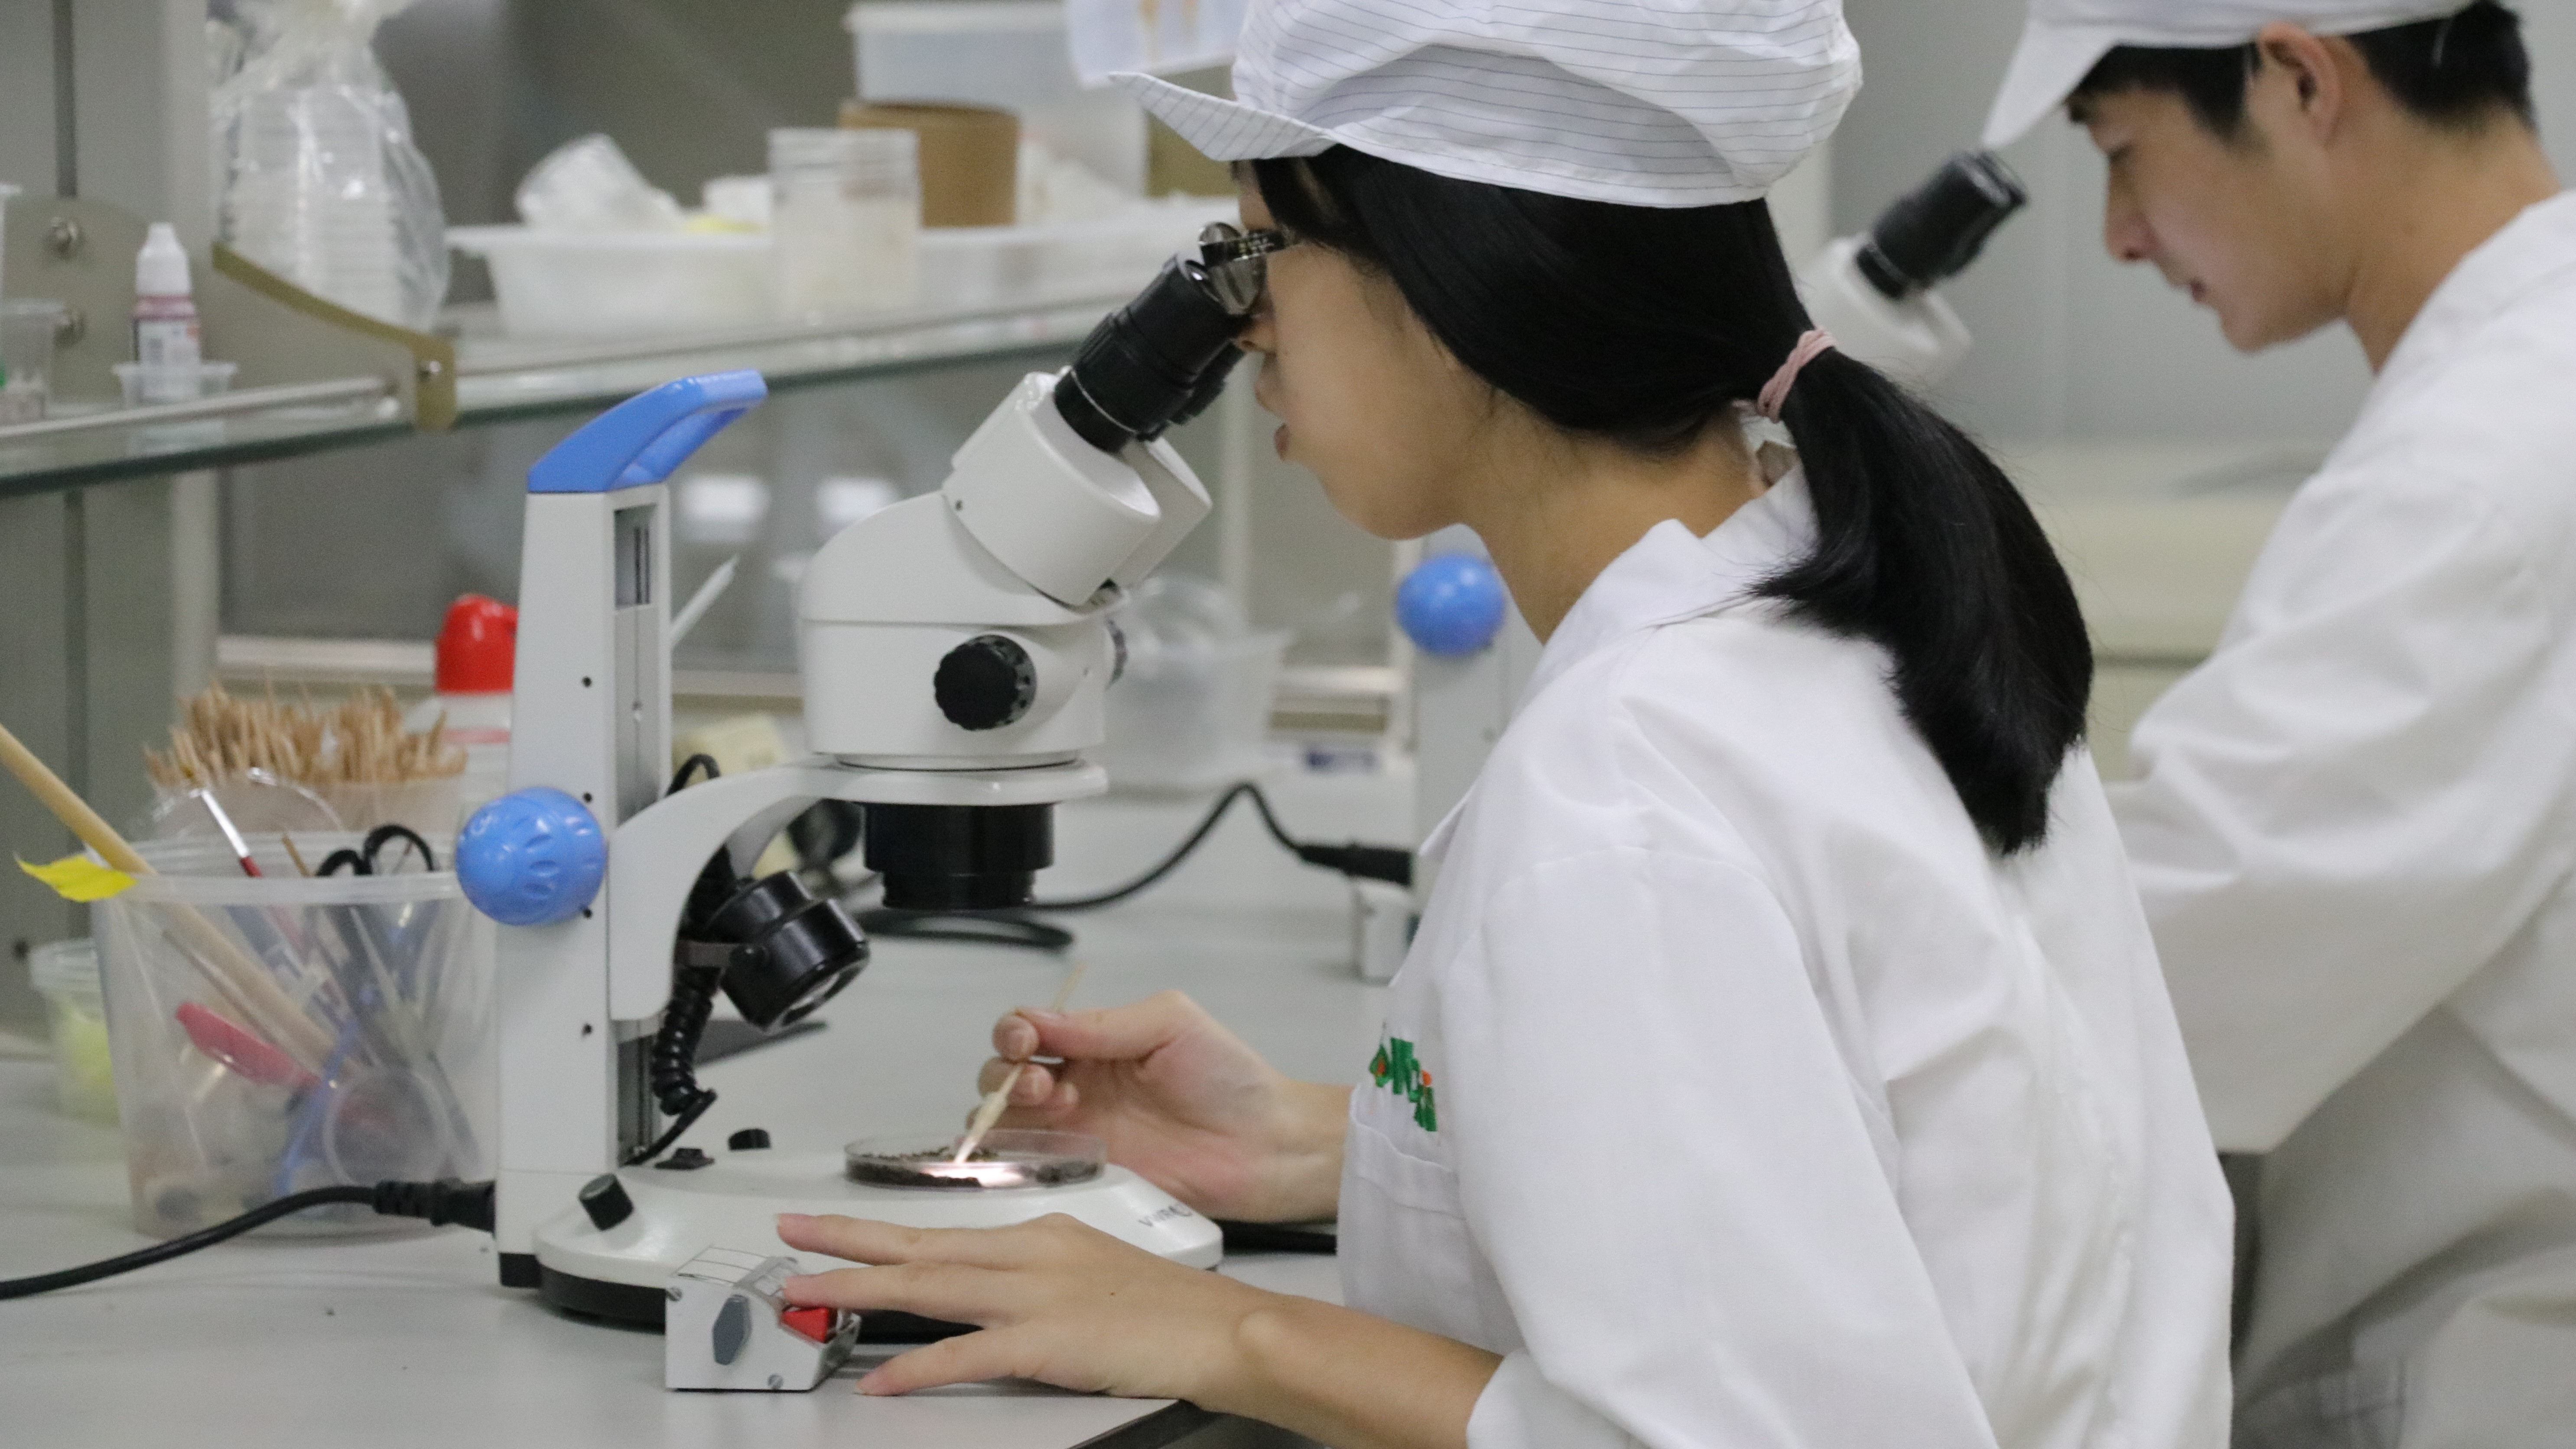 http://ubeat.com.cuhk.edu.hk/wp-content/uploads/2018/137_mosquito_9-1.jpg